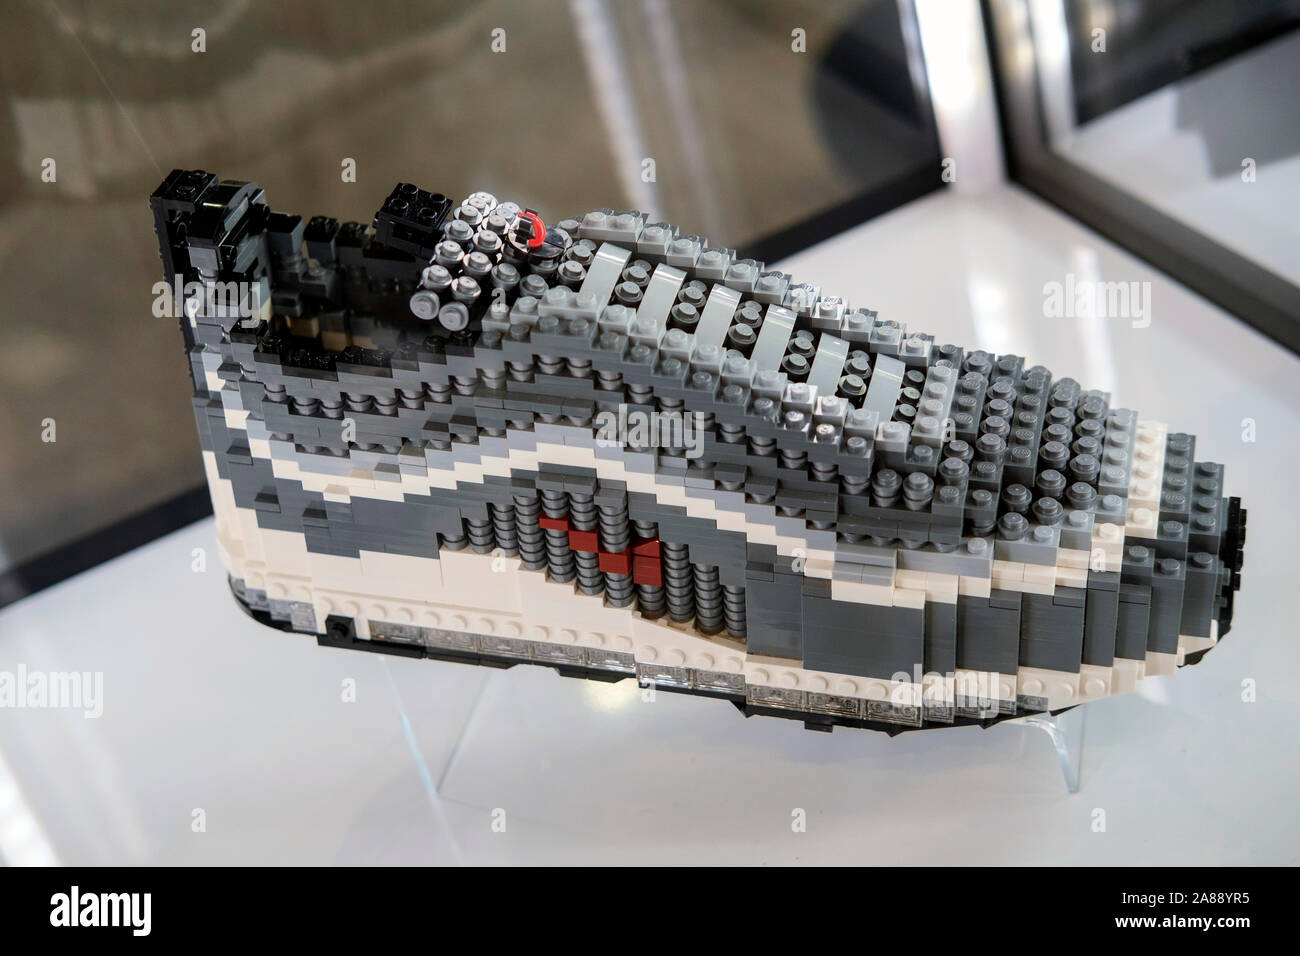 Bilder Schuhe Schuhe StockfotosIkonische Ikonische Alamy 354RLqAj